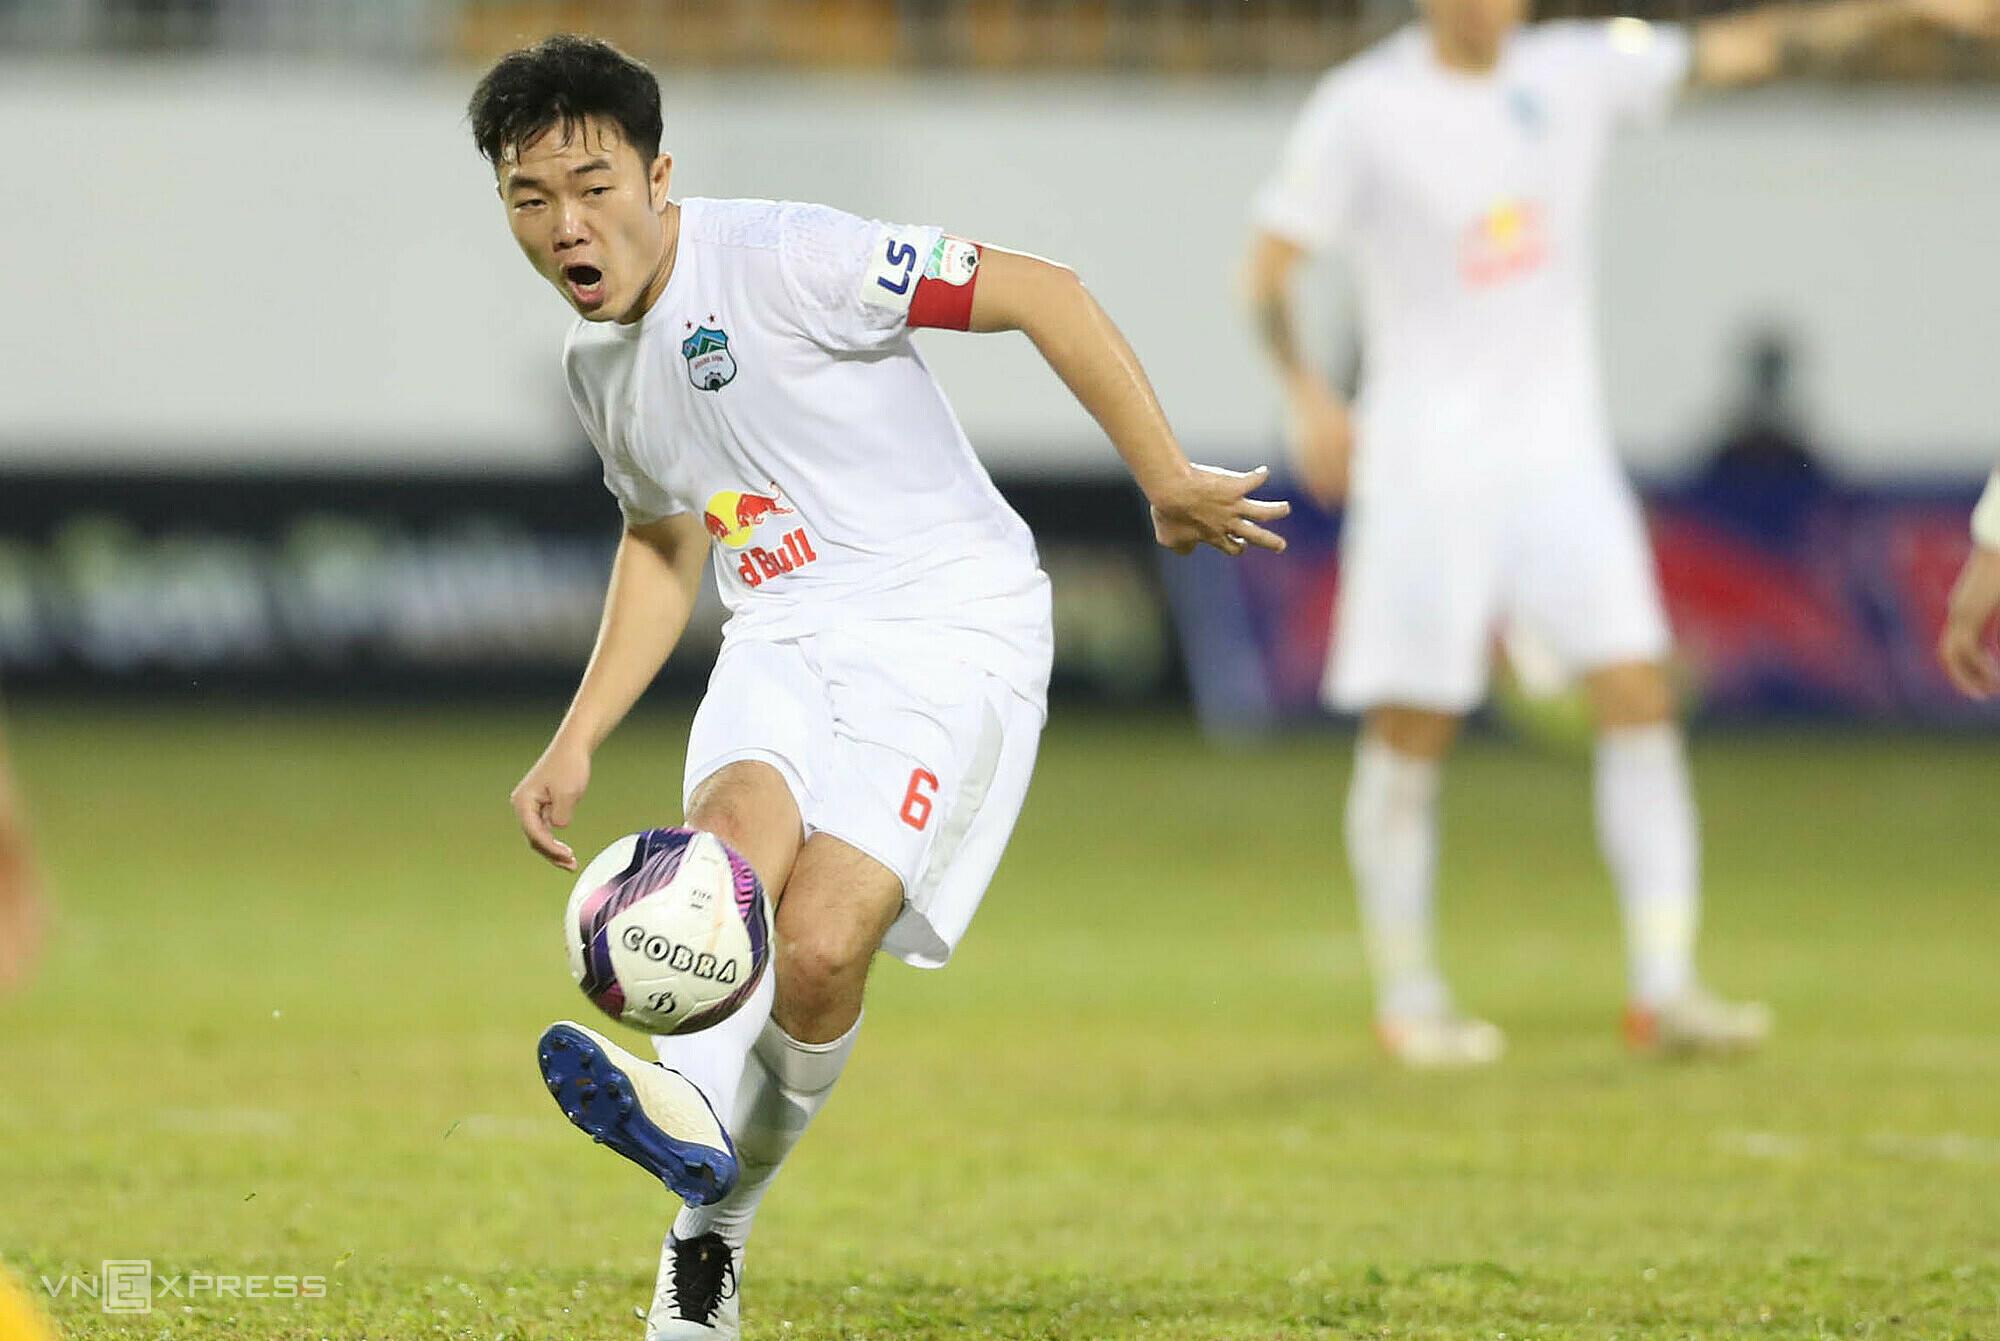 Xuan Truong และเพื่อนร่วมทีมจะได้รับ Binh Dinh ในรอบที่สามของการแข่งขันชดเชยเมื่อ V-League กลับมา  ภาพ: Duc Dong